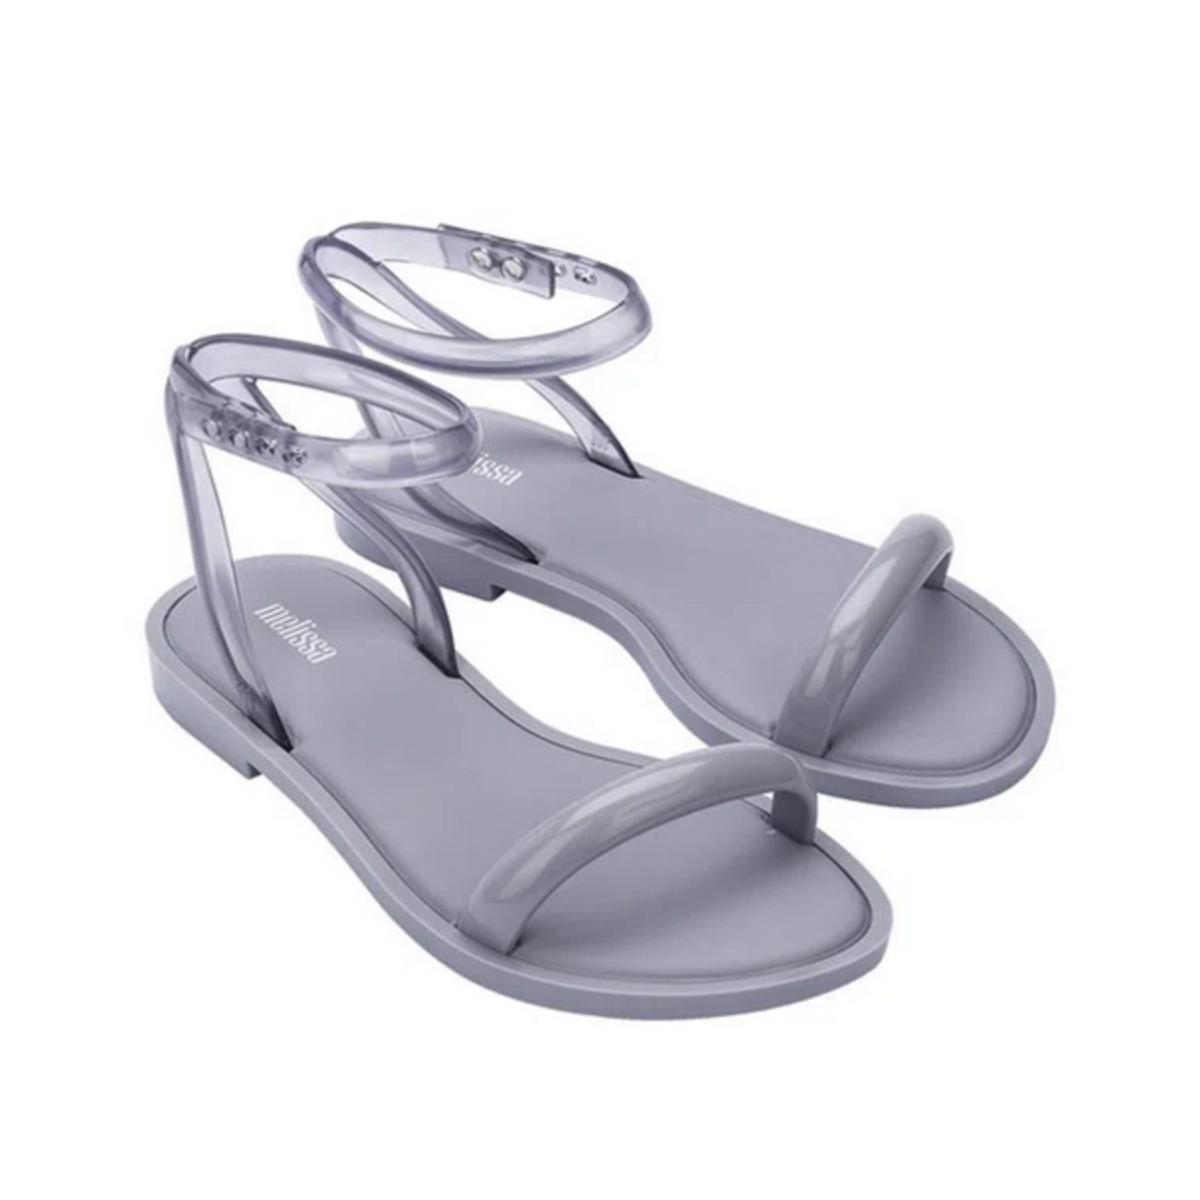 Sandália Feminina Melissa 32942 53839 Wave Sandal Lilas